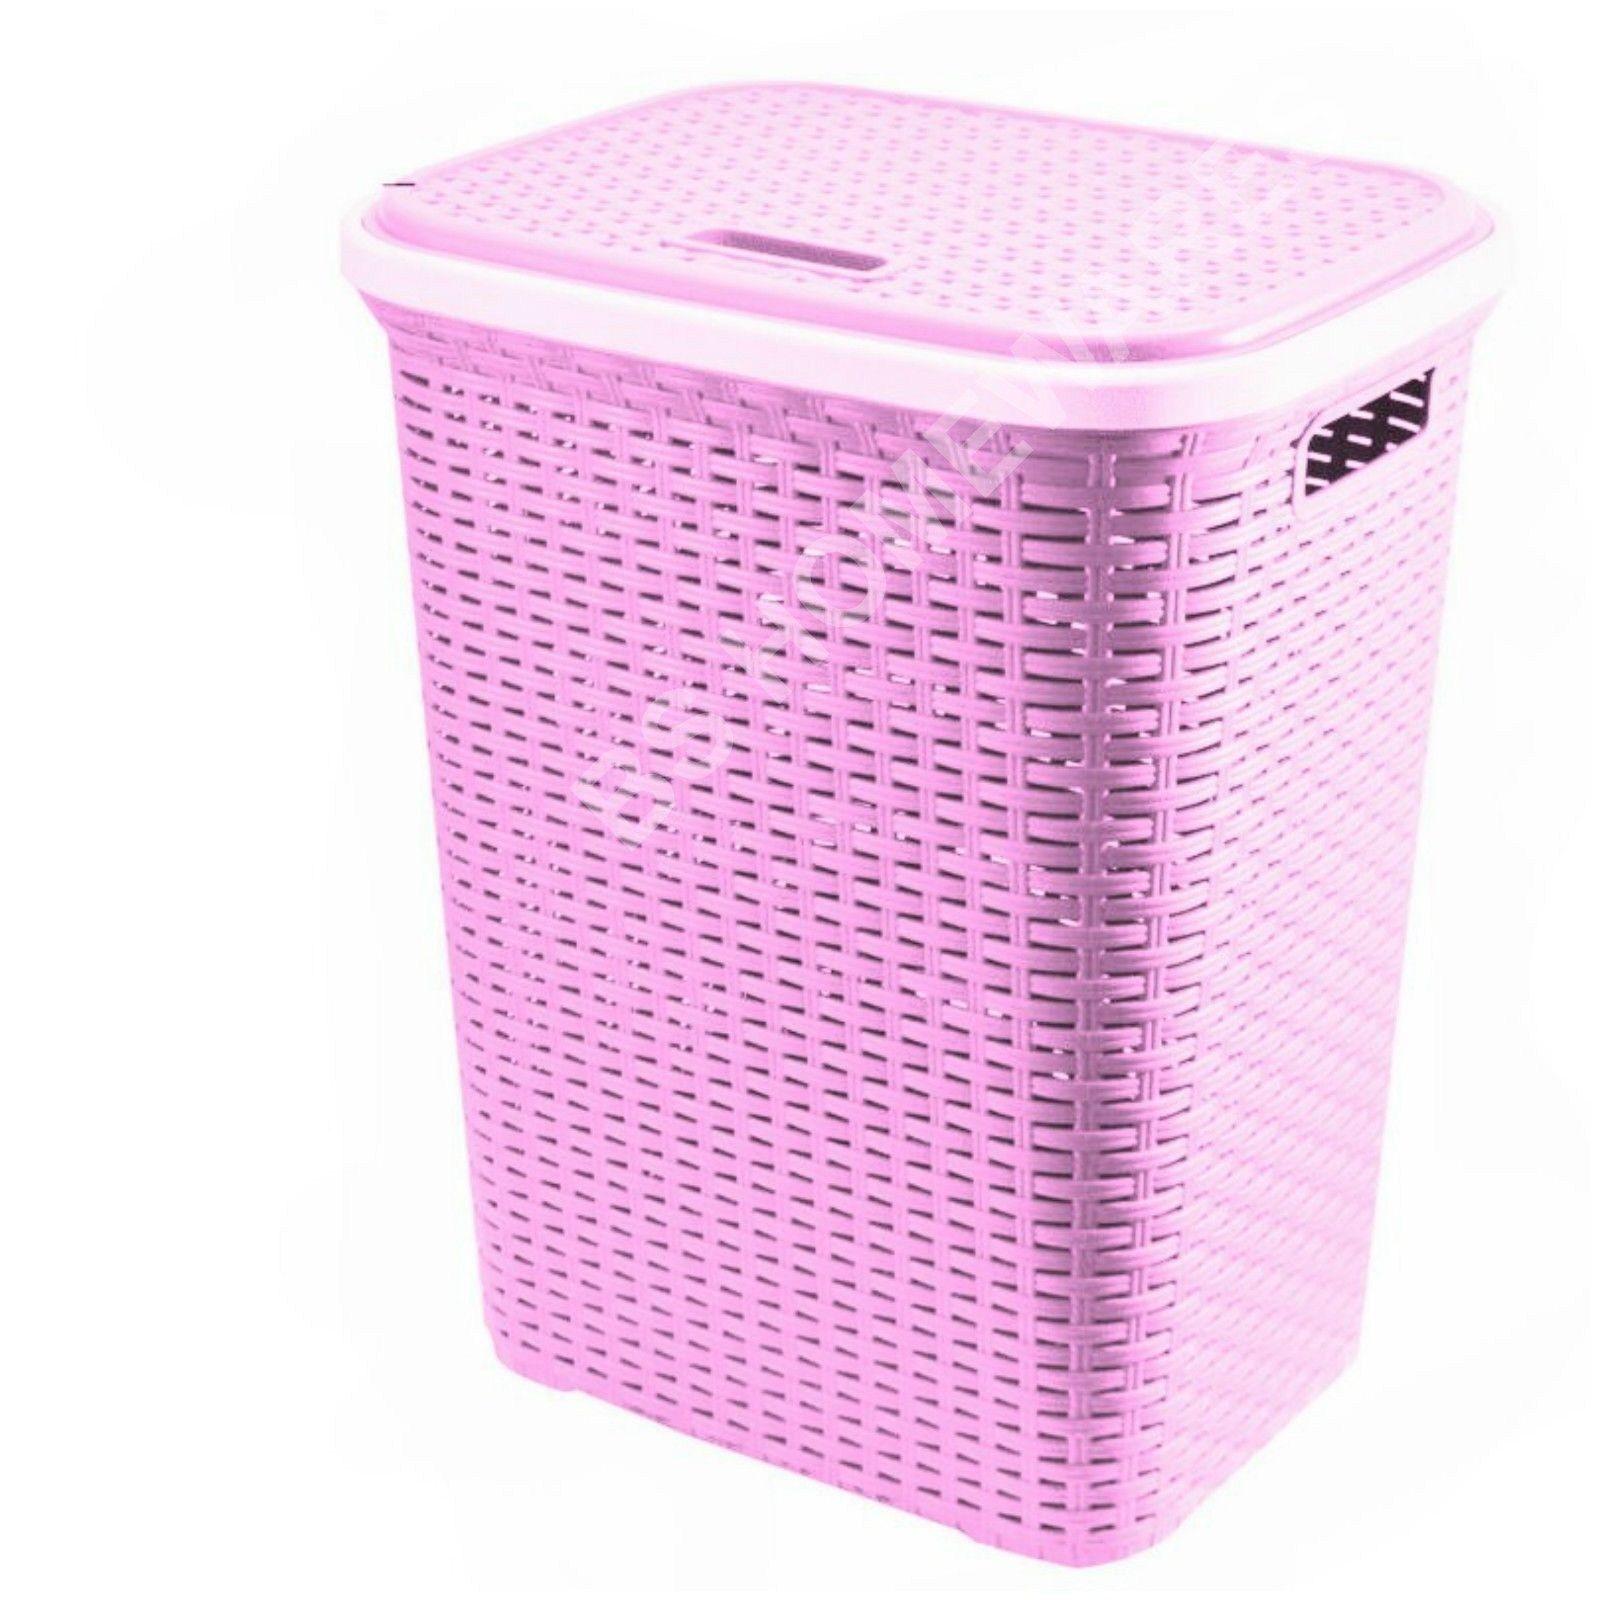 Plastic Laundry Basket Rattan Style 56l Cloth Washing Storage